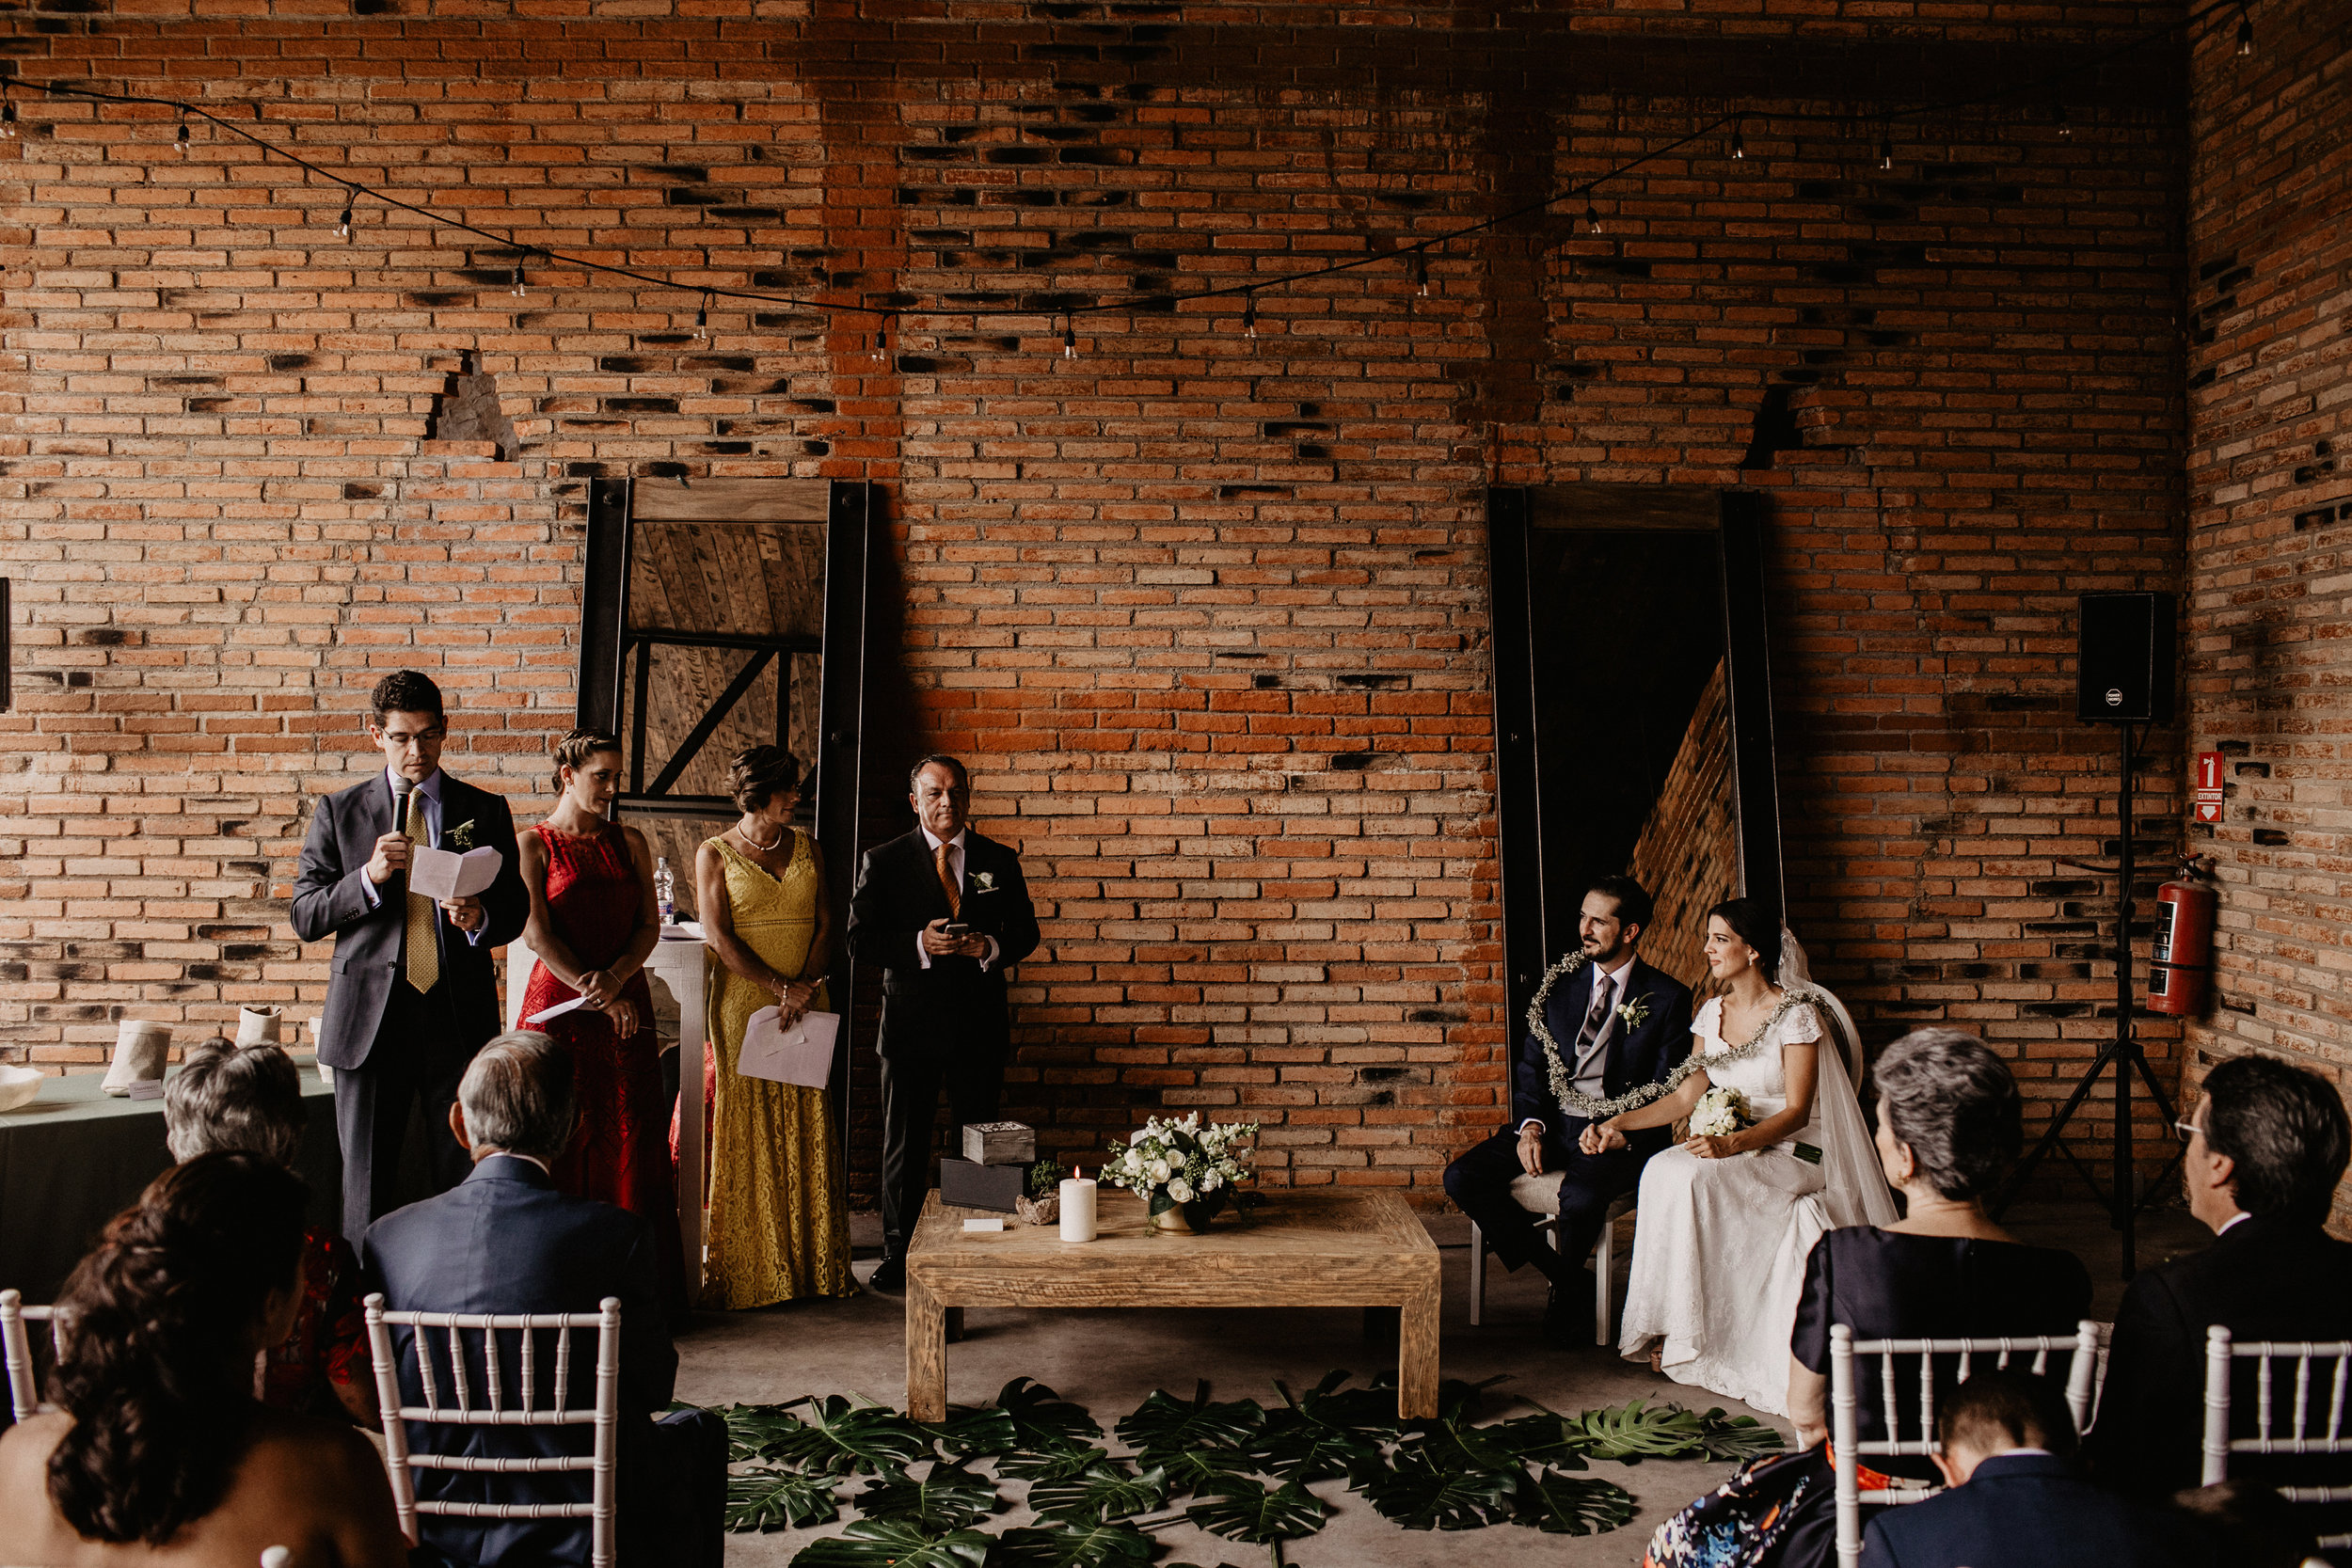 alfonso_flores_destination_wedding_photographer_pau_alonso_490.JPG